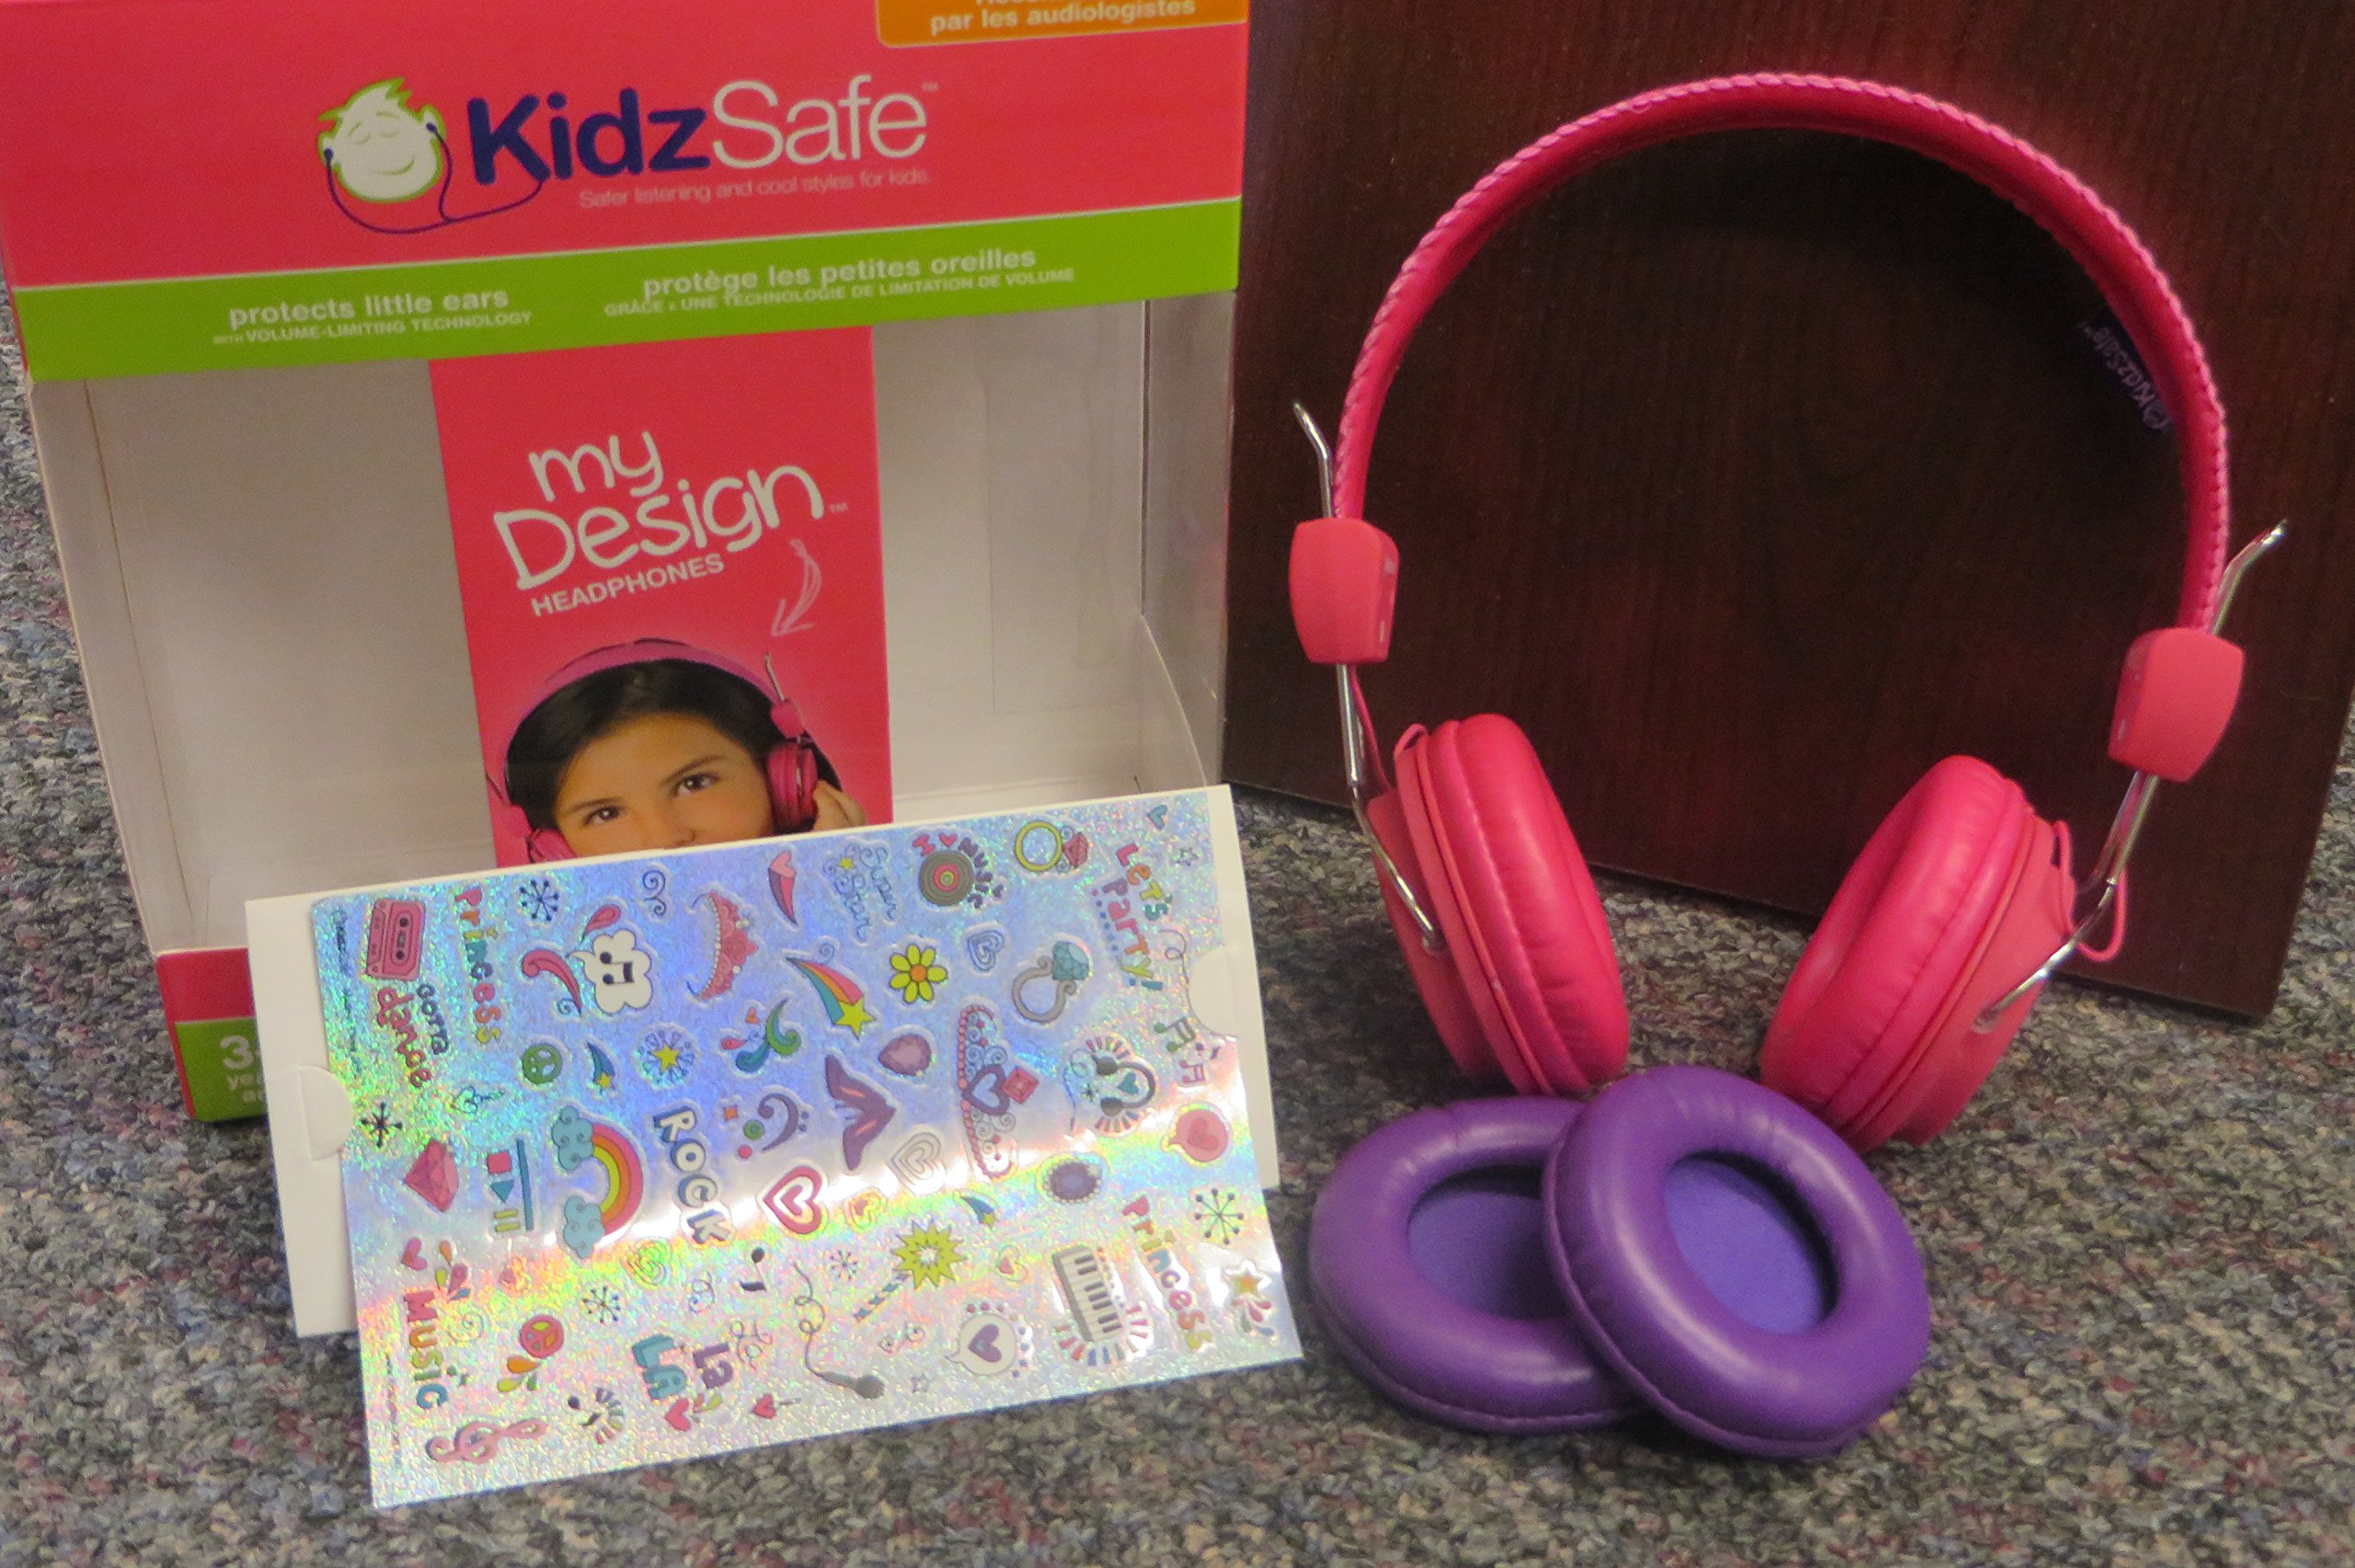 Kidz Safe my Design headphones by SMS audio (Image #2)